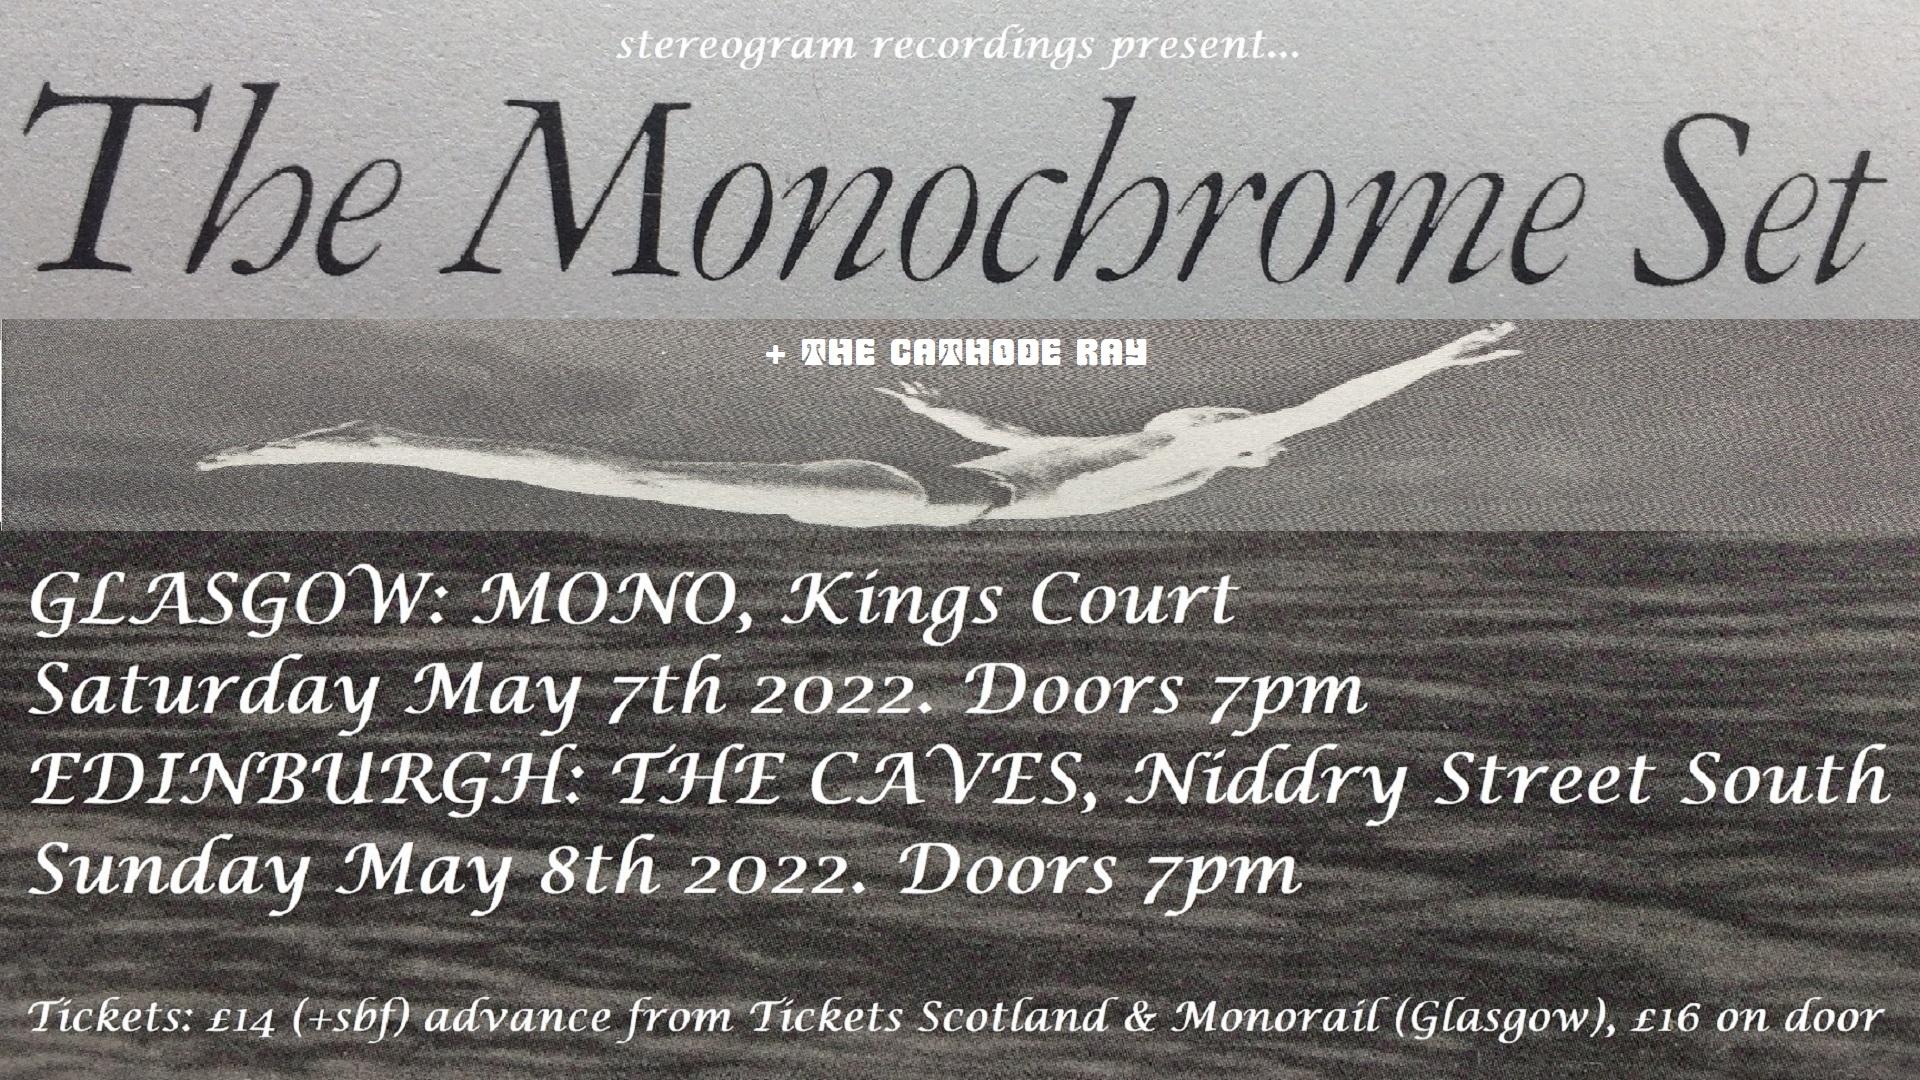 THE MONOCHROME SET + CATHODE RAY 07 & 08.05.22 Facebook Banner